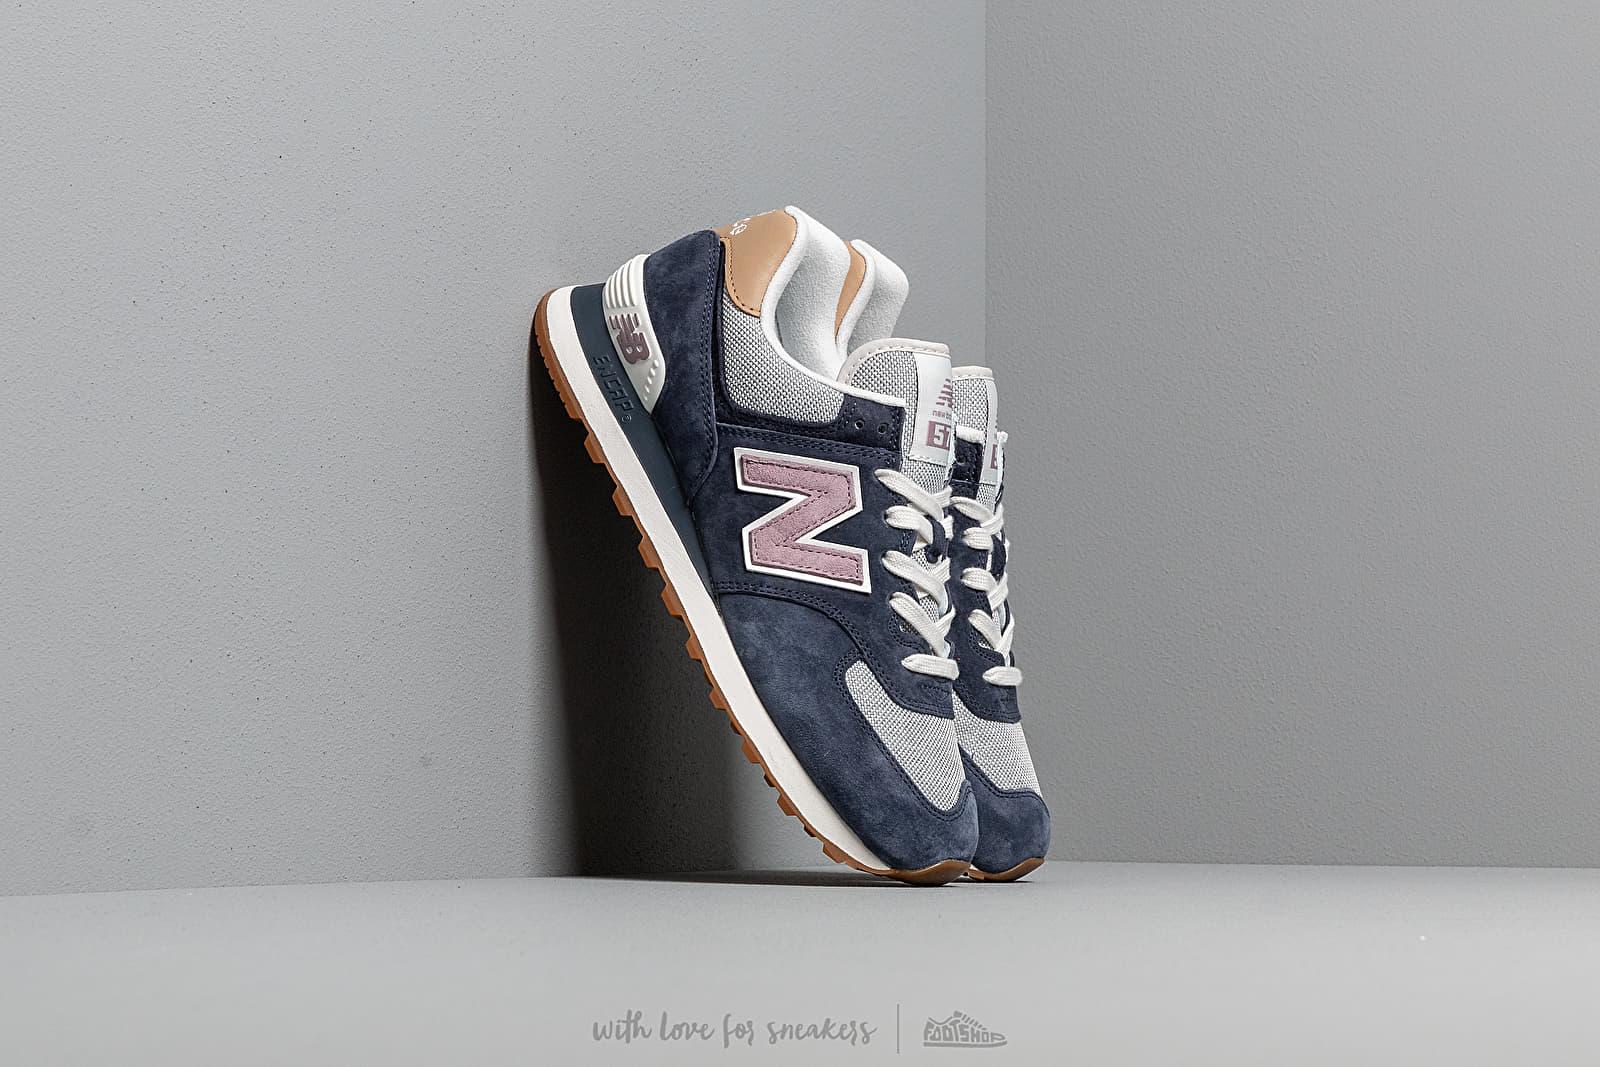 huge selection of eb2e7 d90fd New Balance 574 Navy/ Cashmere | Footshop